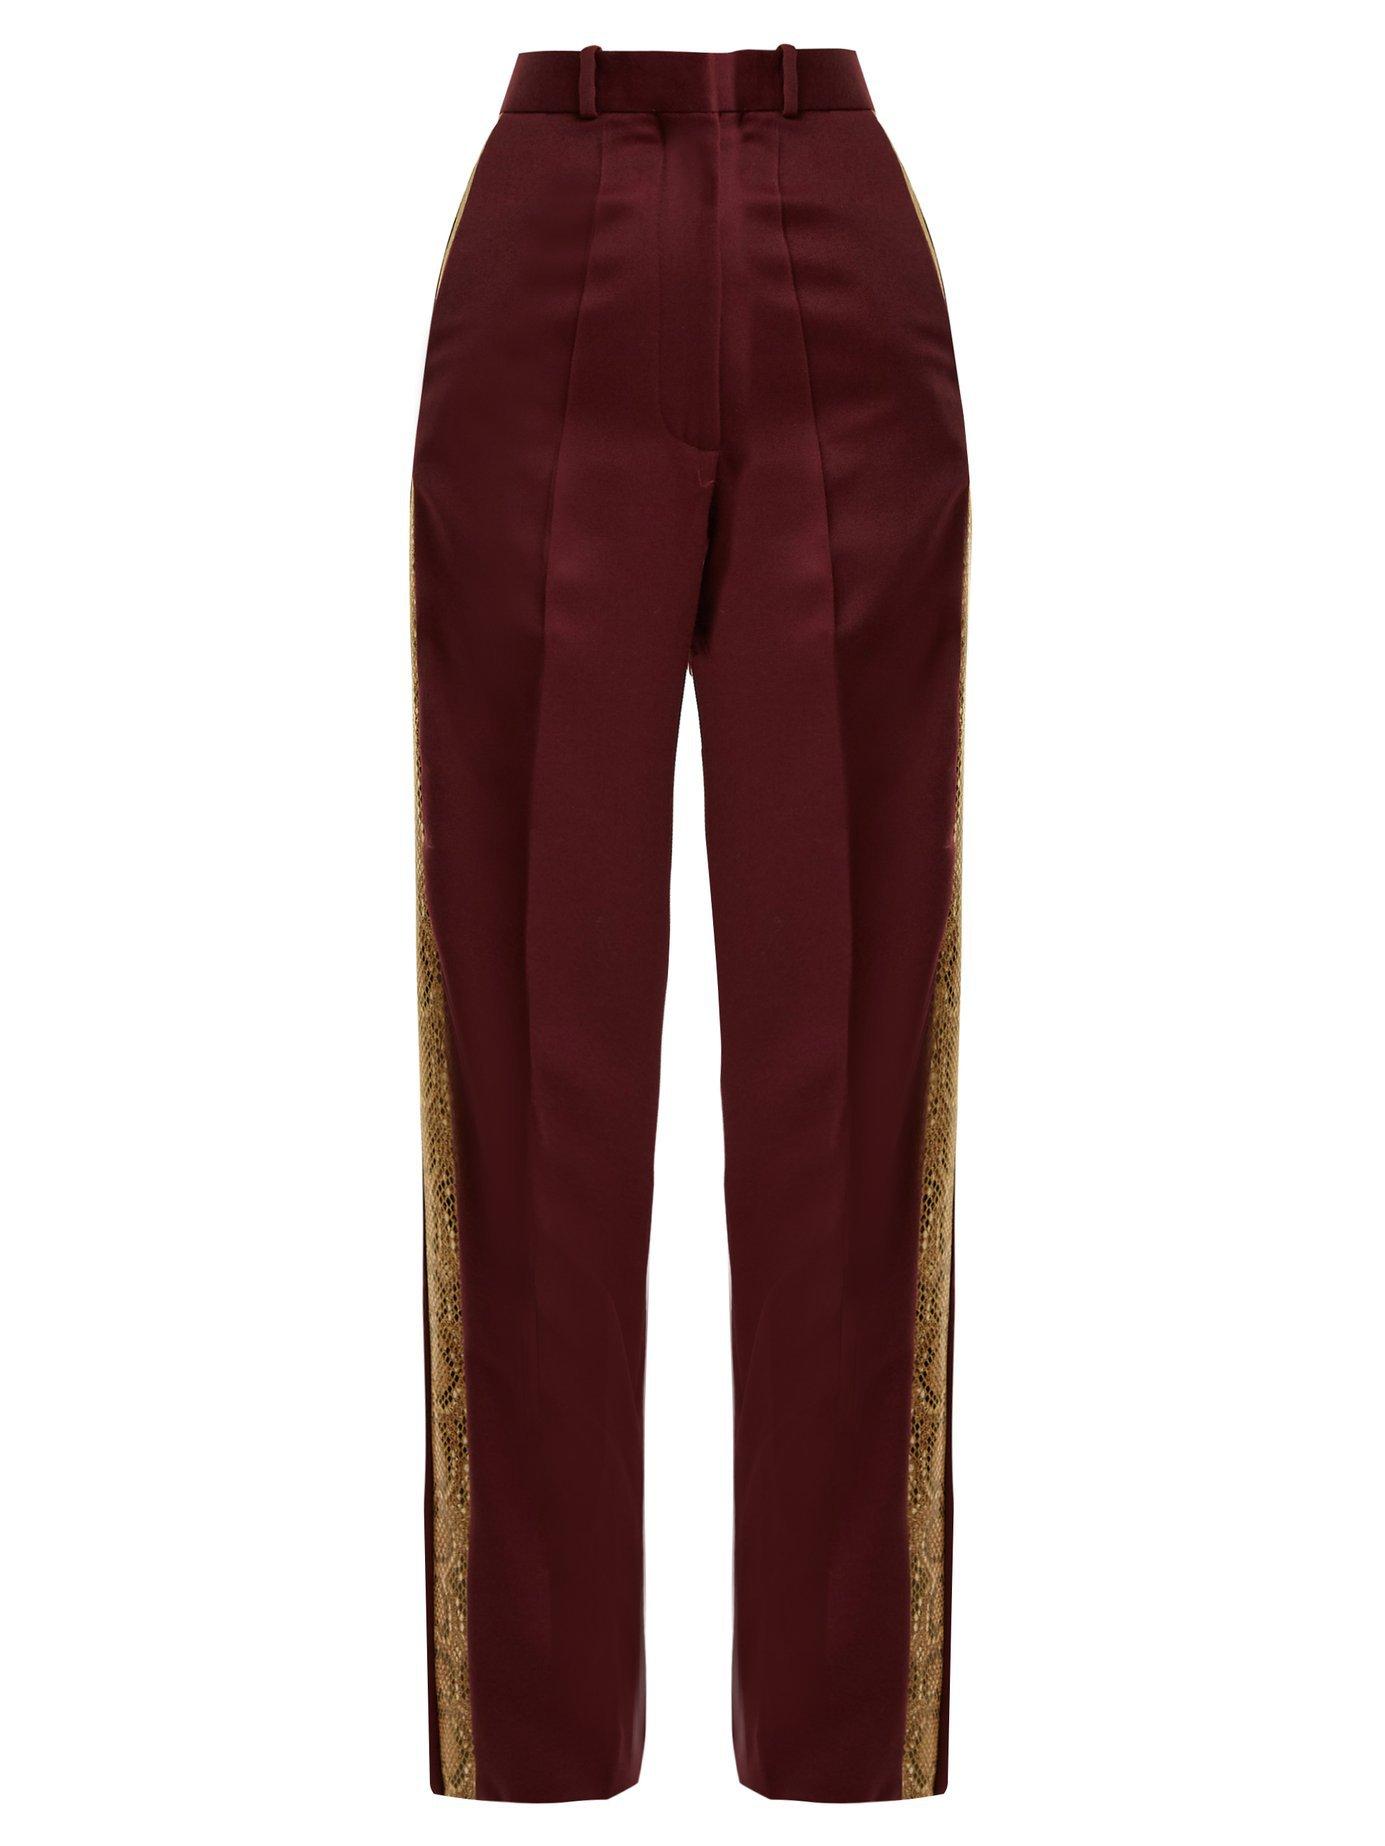 Bathorea faux snake-trimmed wool-blend trousers   Hillier Bartley   MATCHESFASHION.COM US